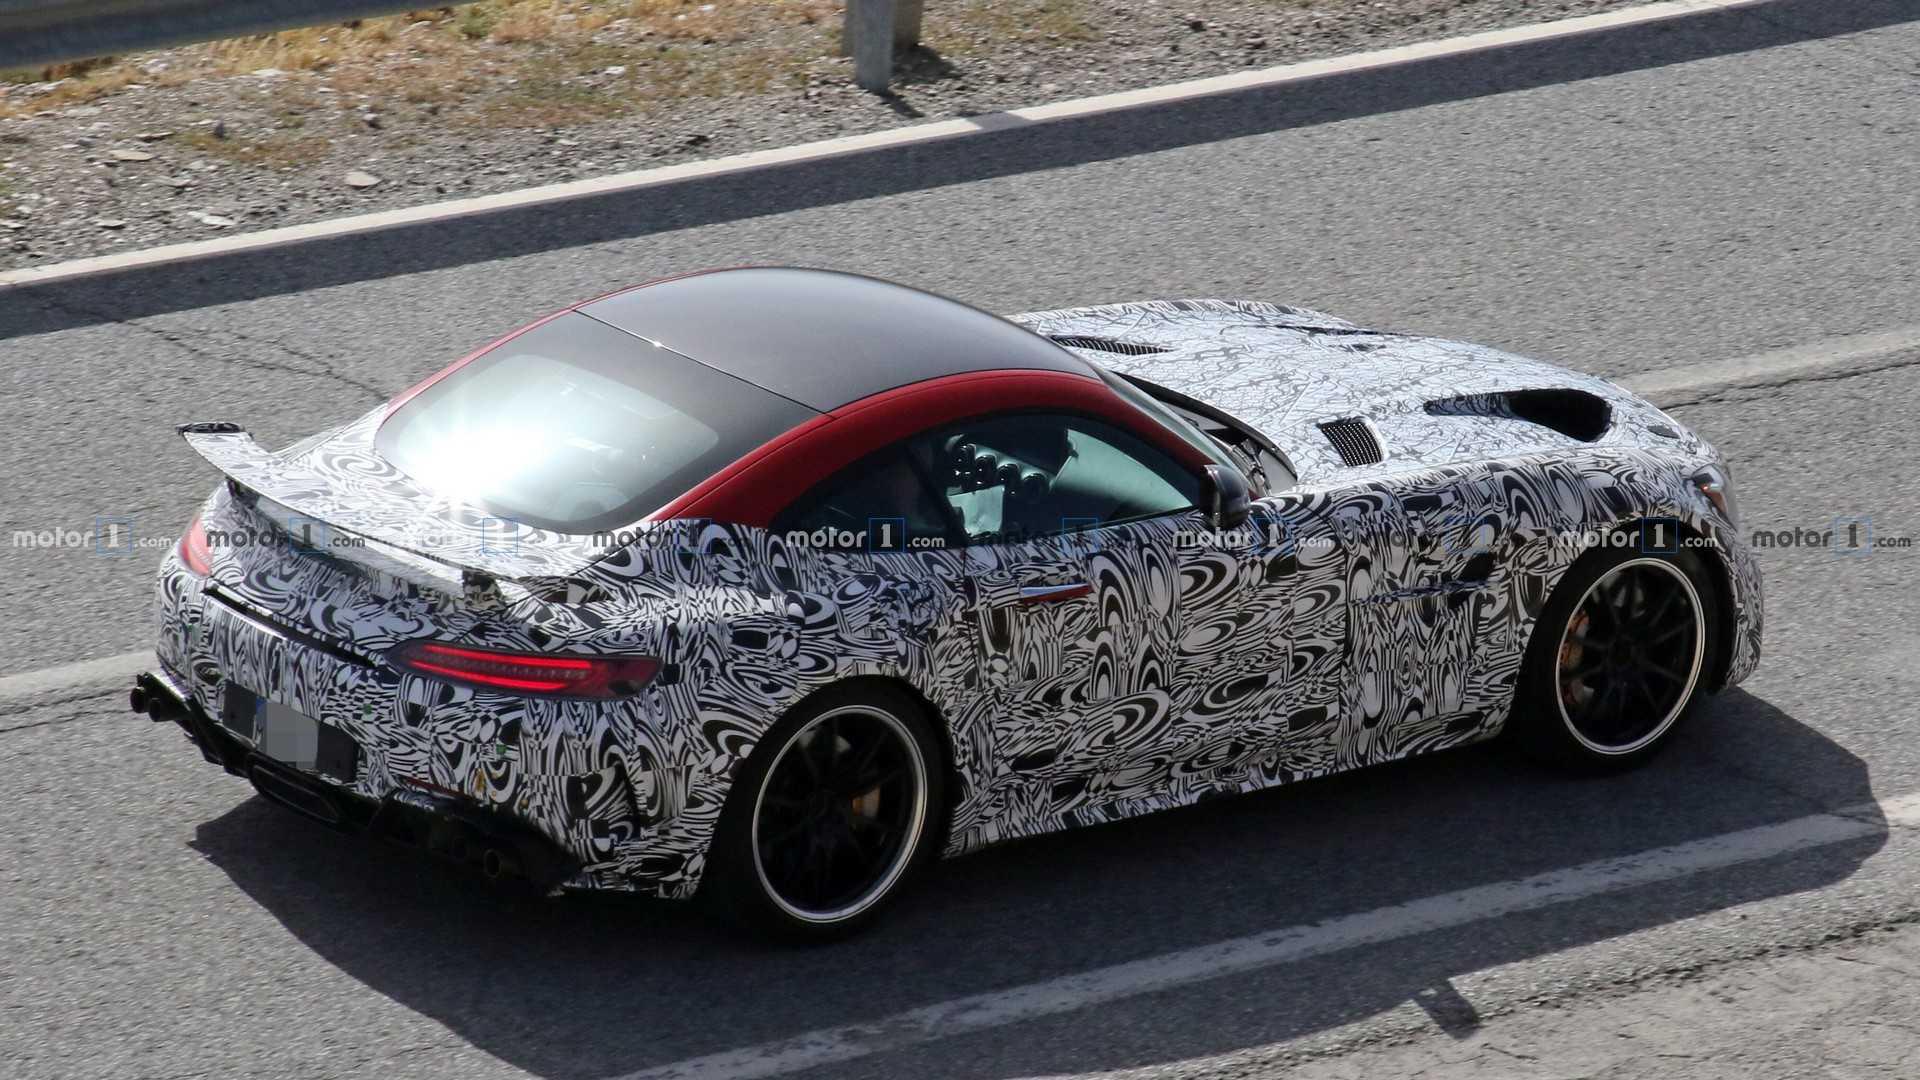 Nuova Mercedes-AMG GT R Black Series prototipo foto spia